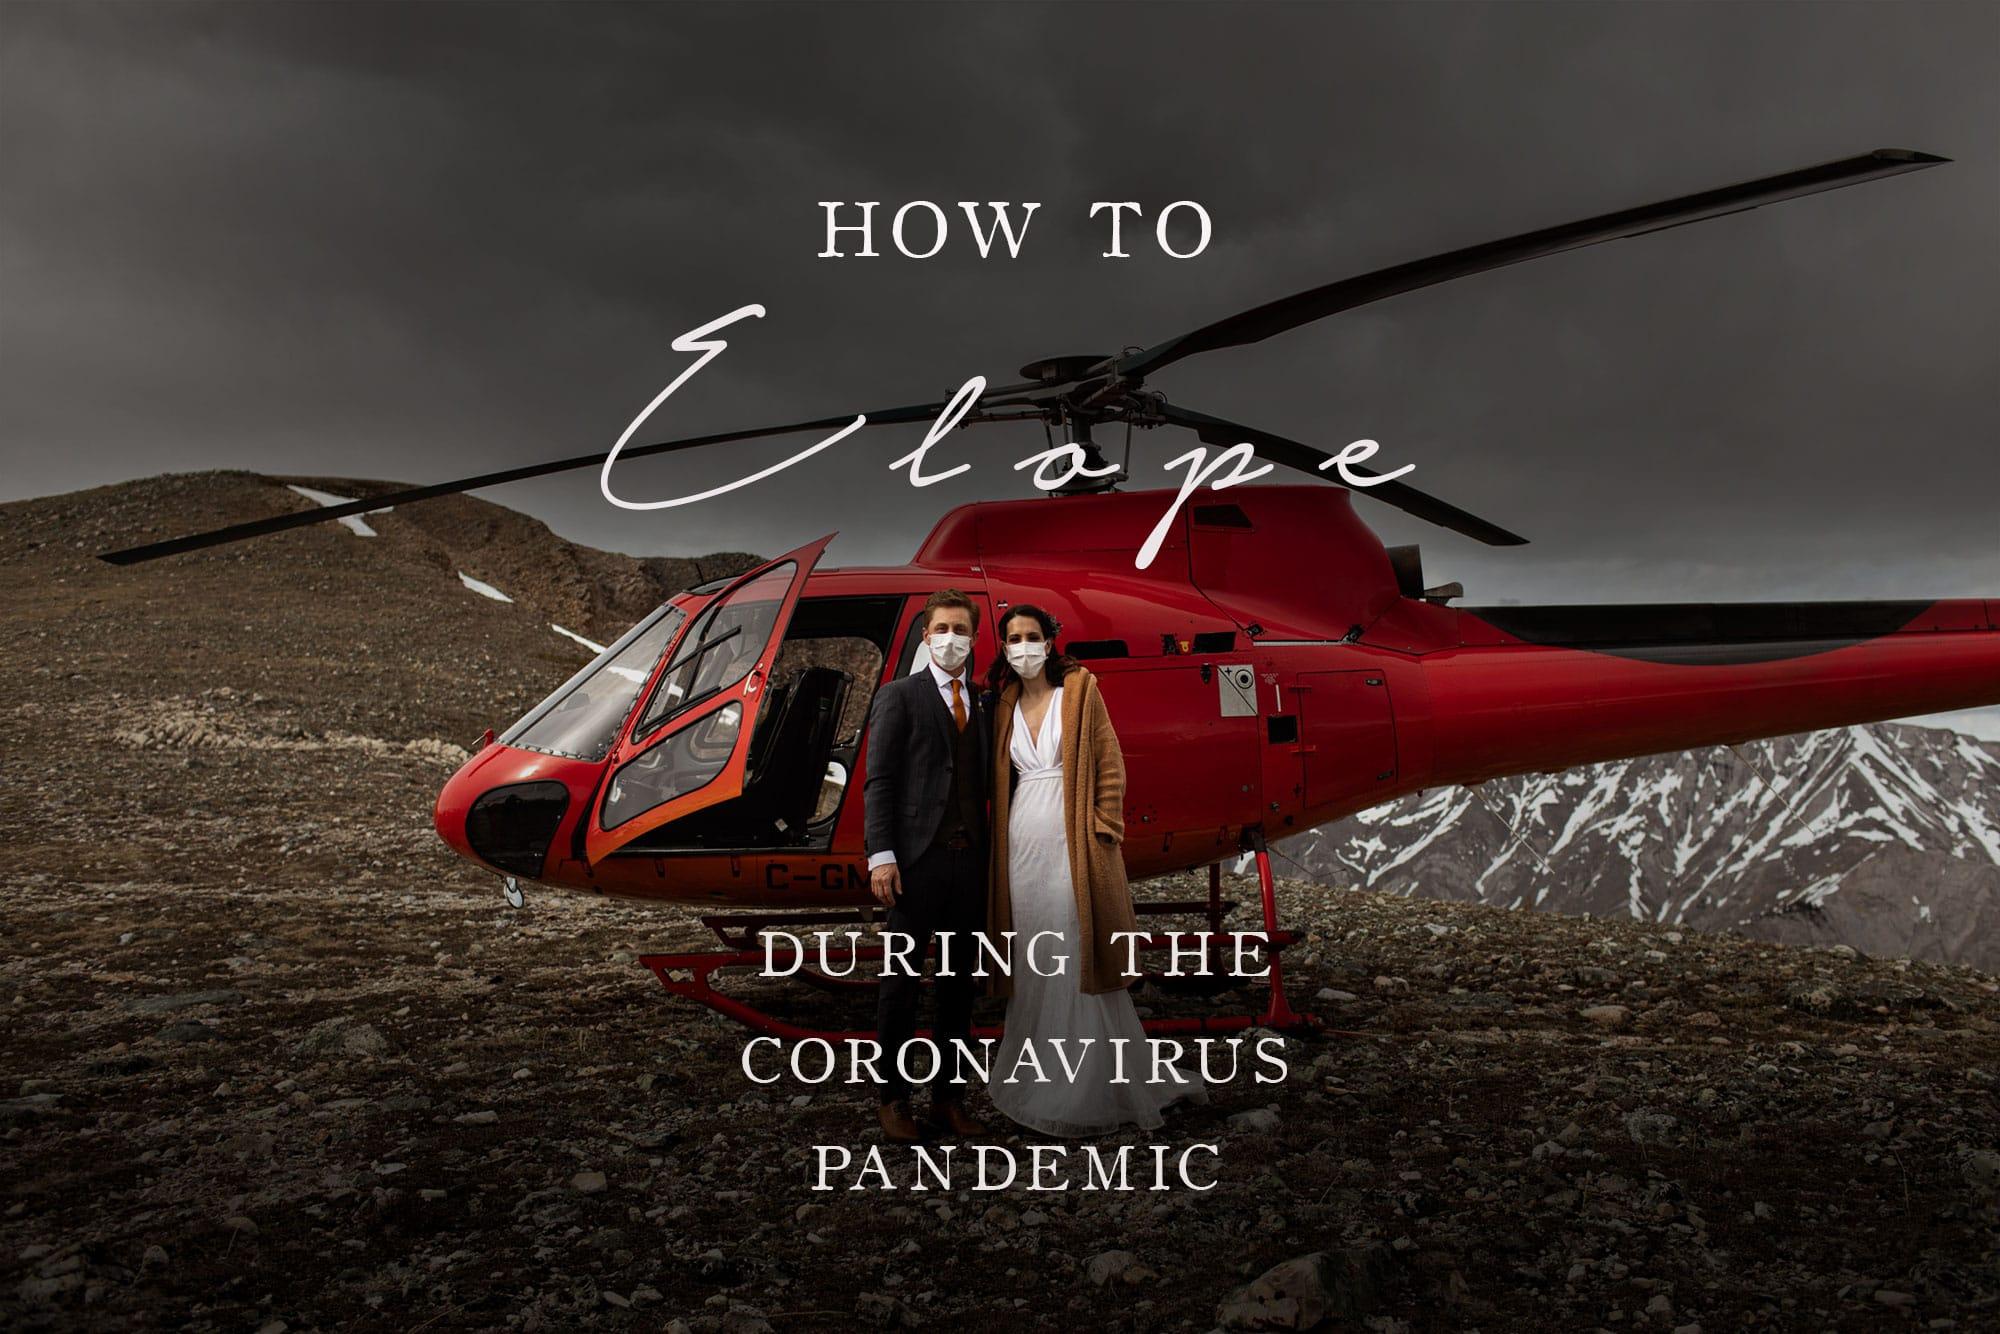 how to elope during the coronavirus pandemic